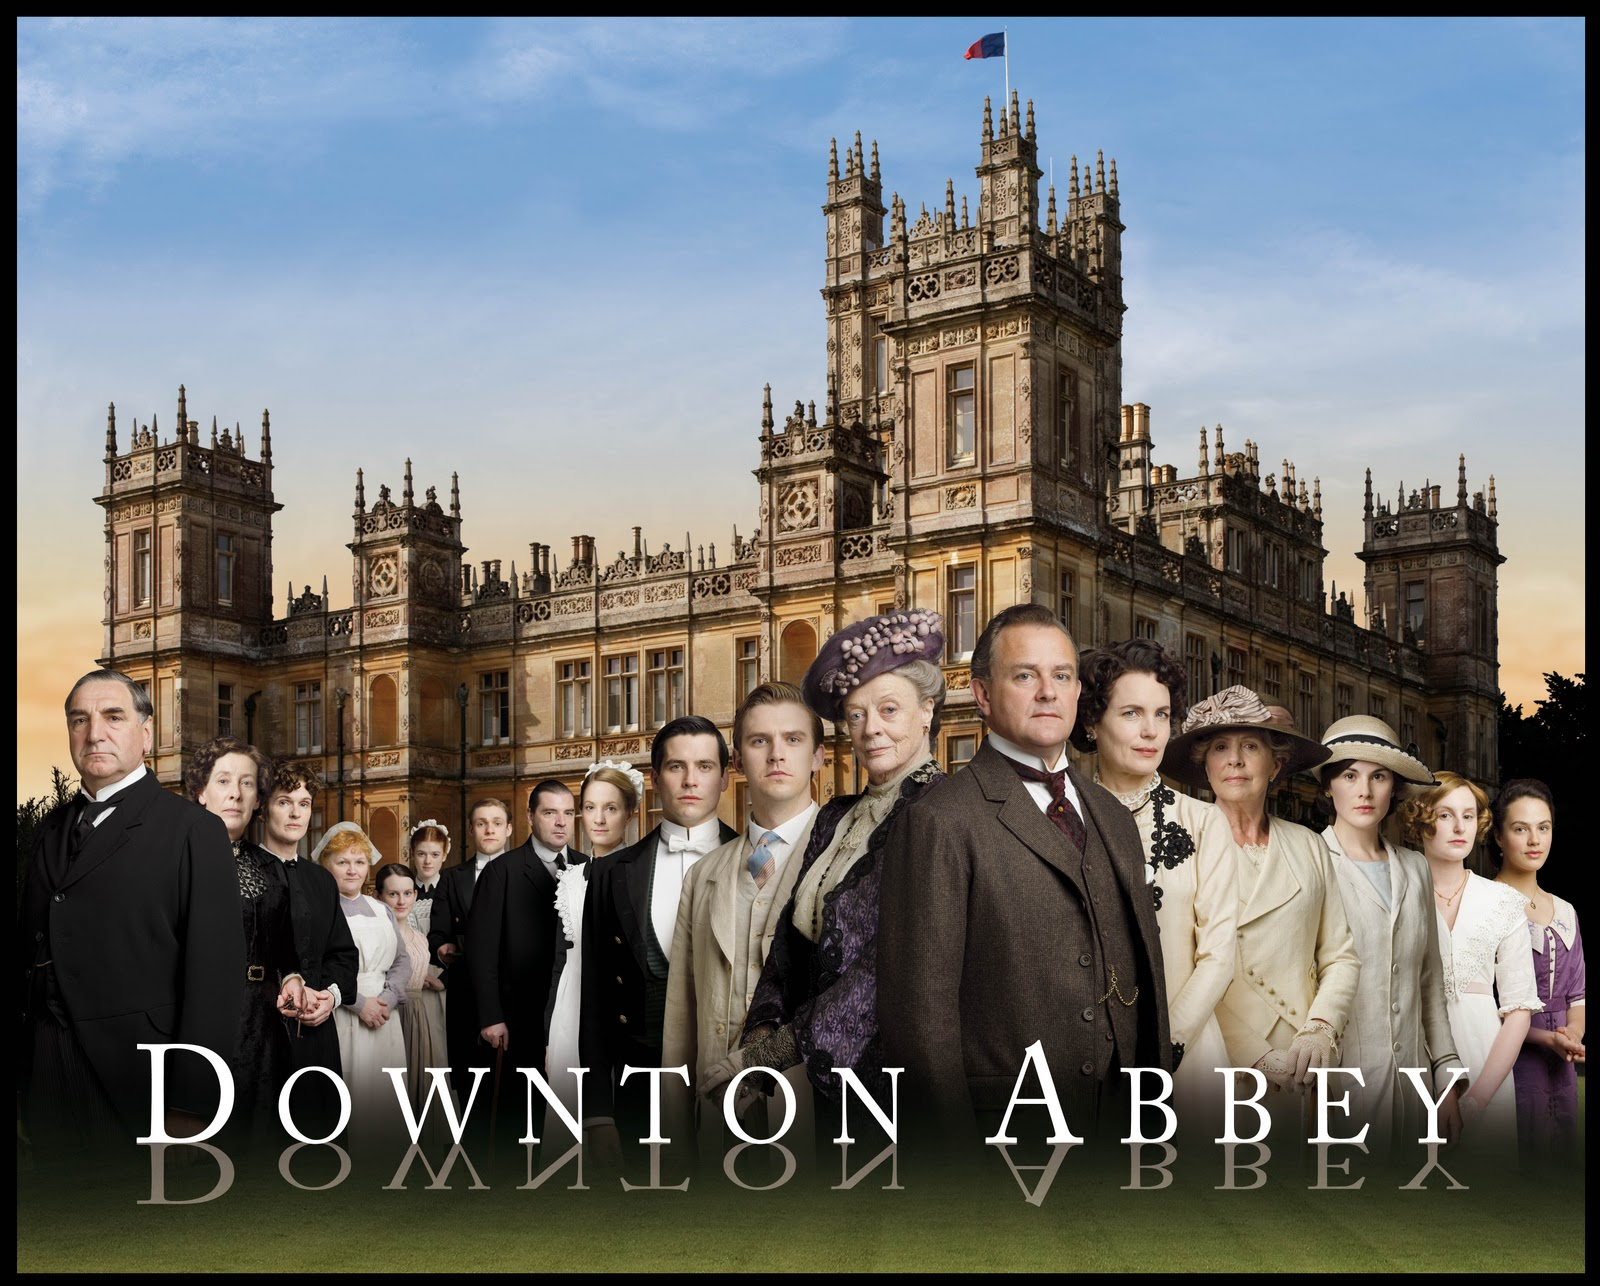 Bibliografia essencial de Downton Abbey